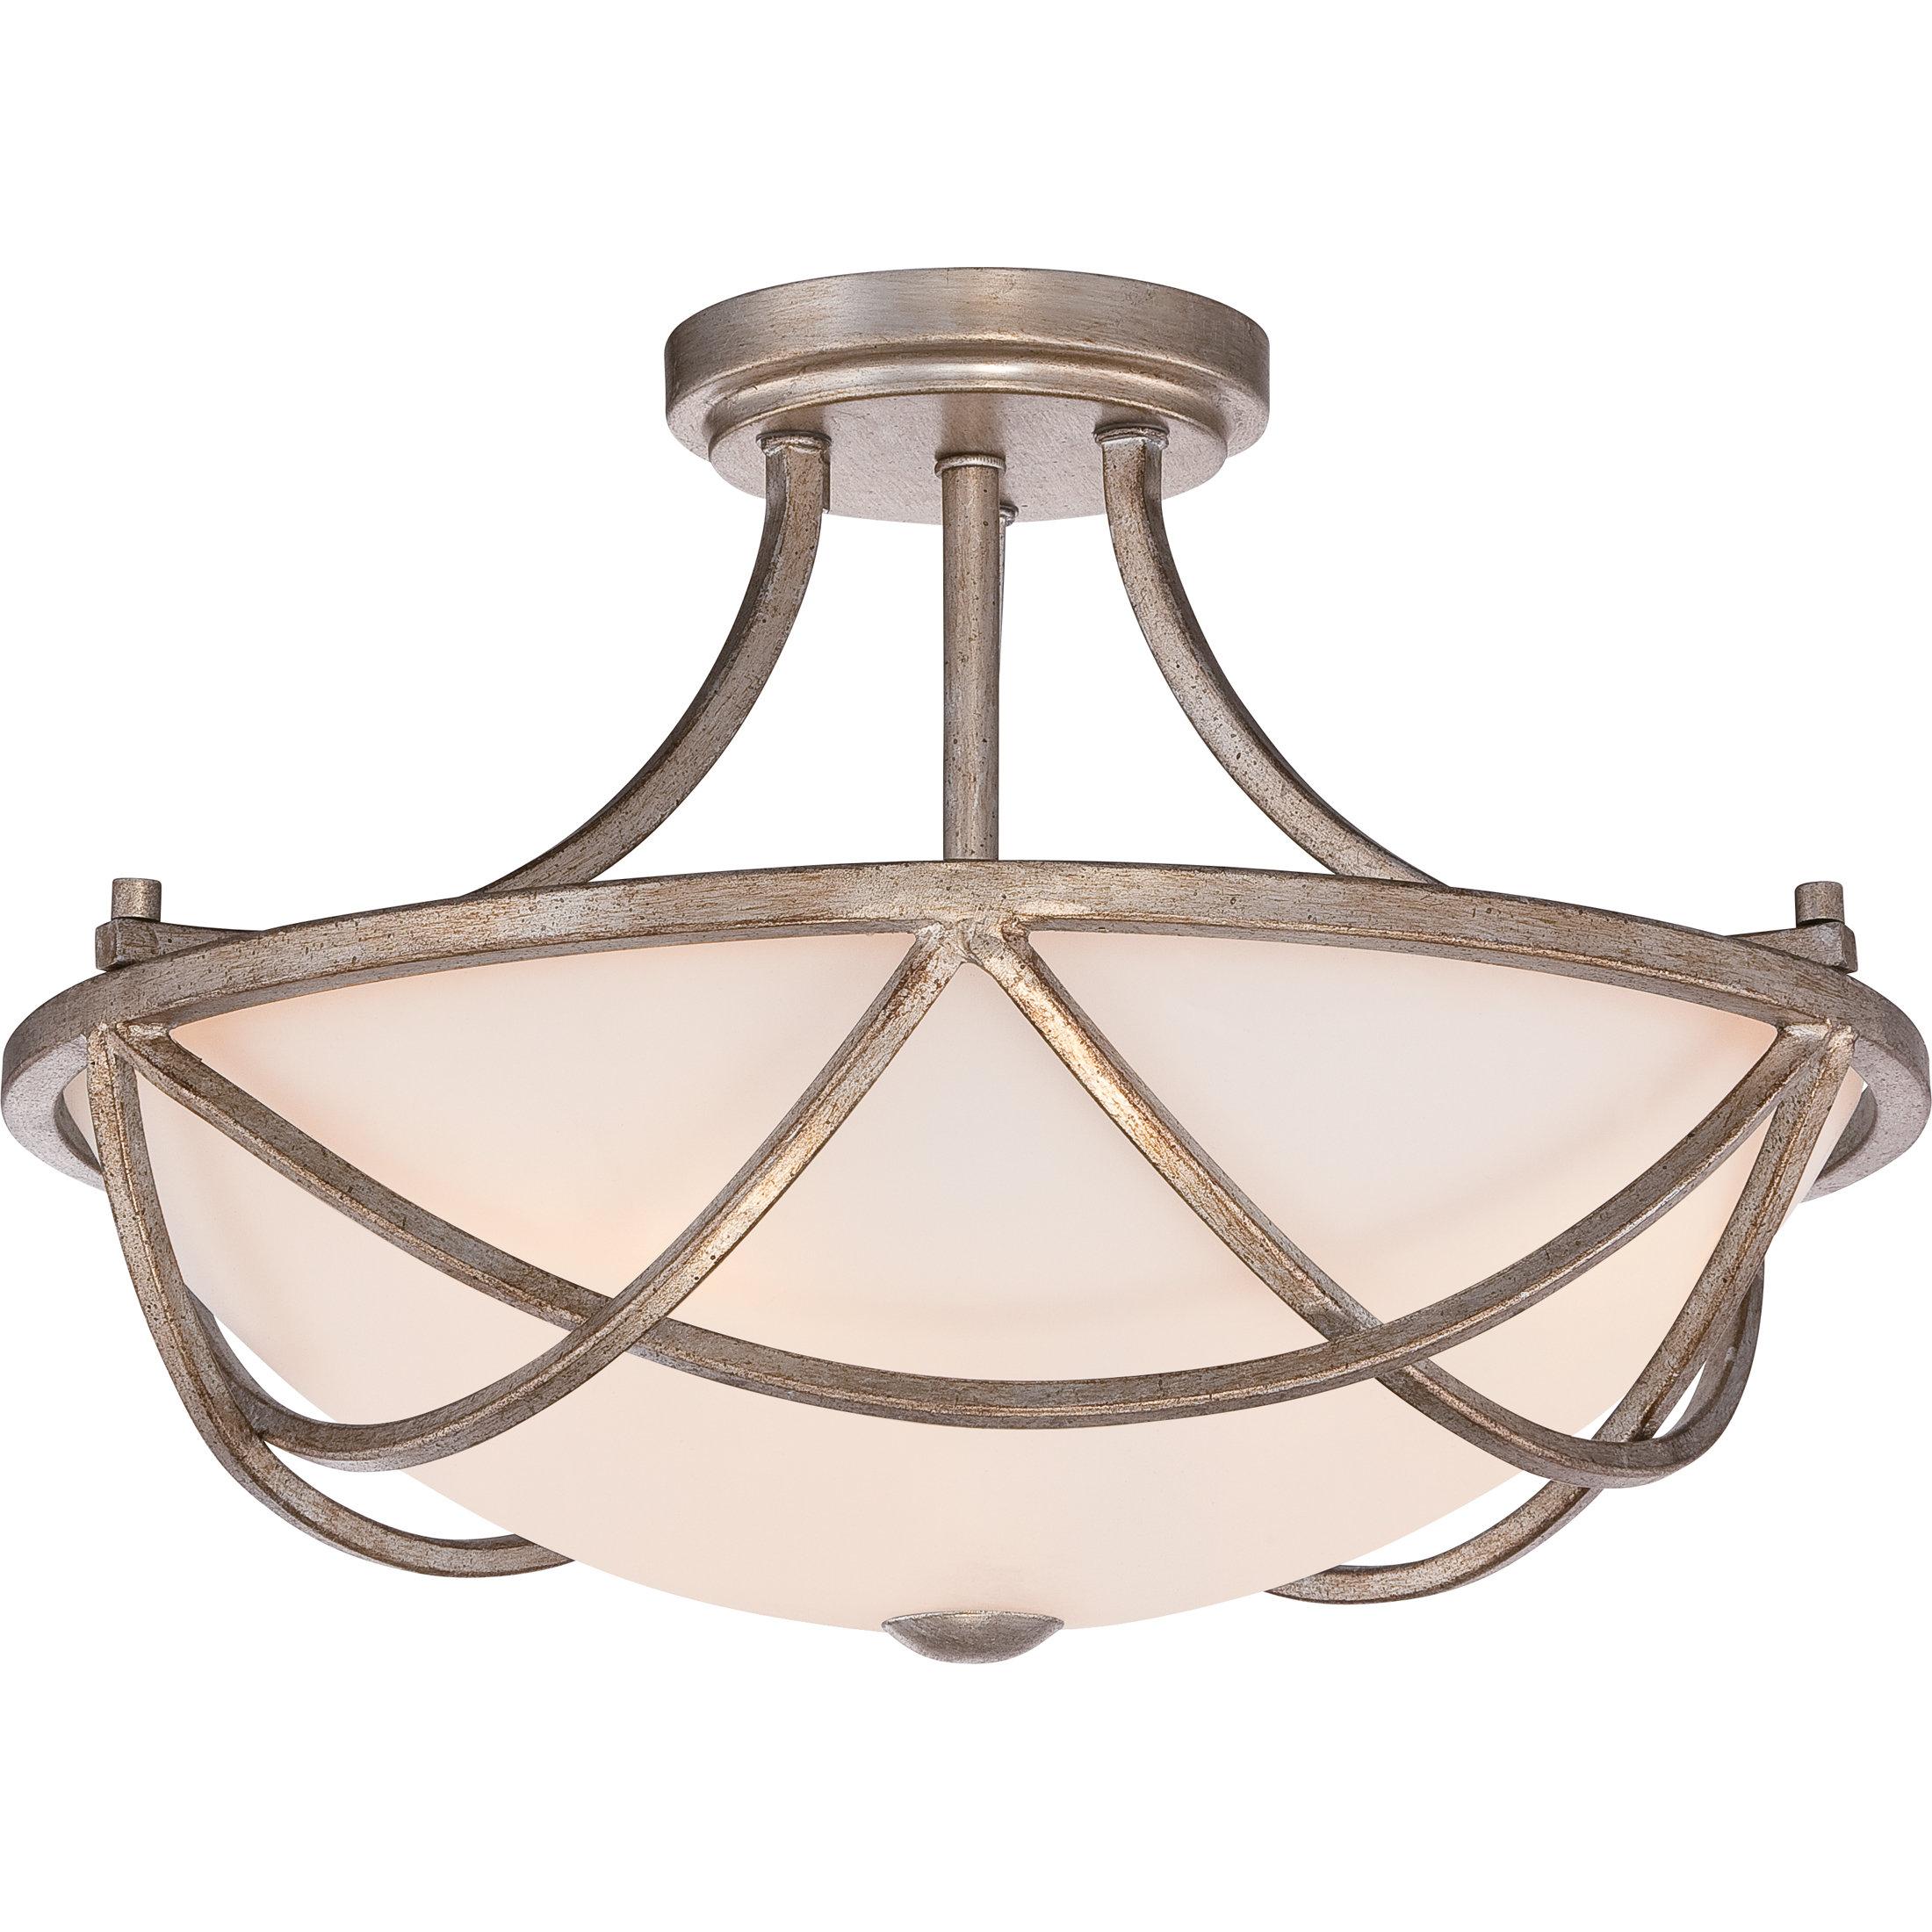 Well Liked Hedda 2 Light Single Bowl Pendant For Newent 3 Light Single Bowl Pendants (View 25 of 25)